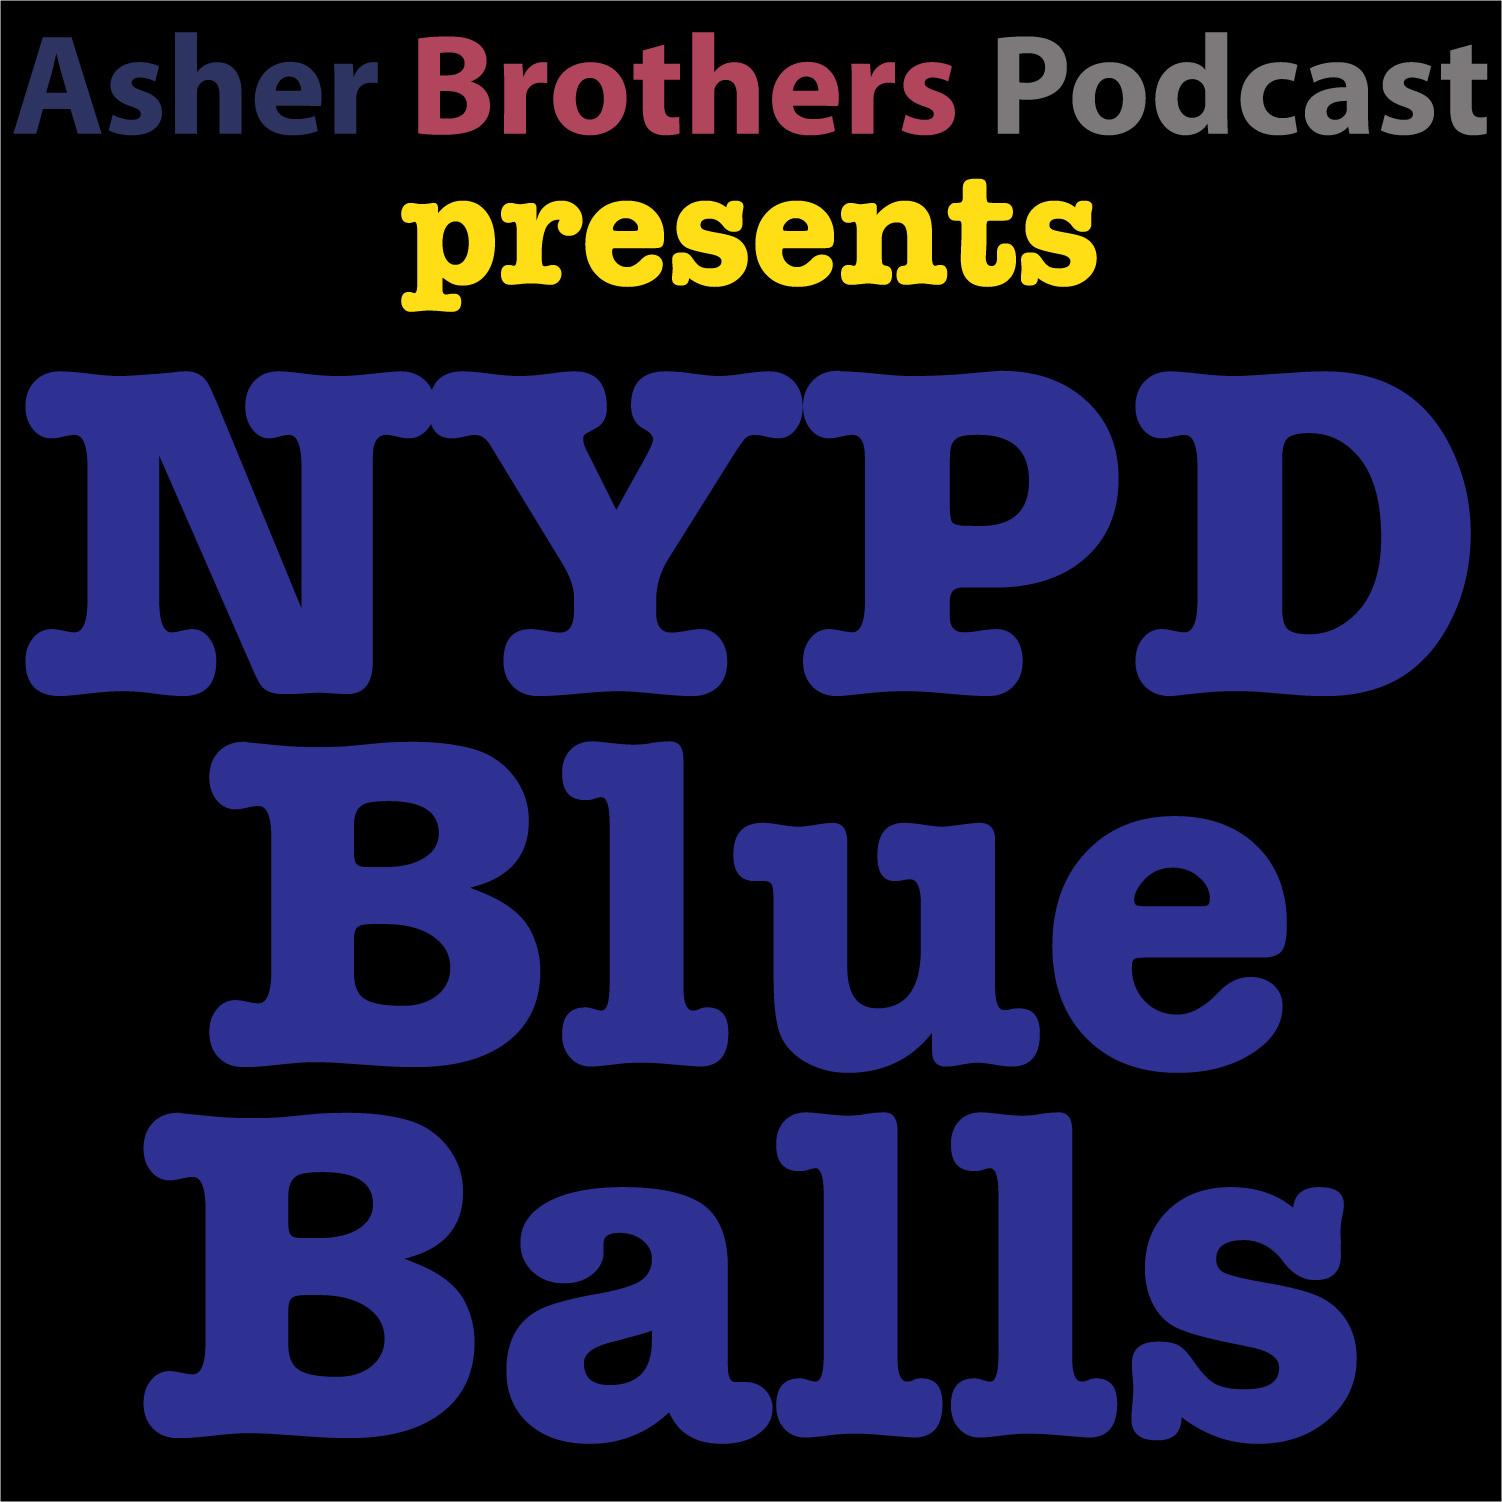 NYPD Blue Balls